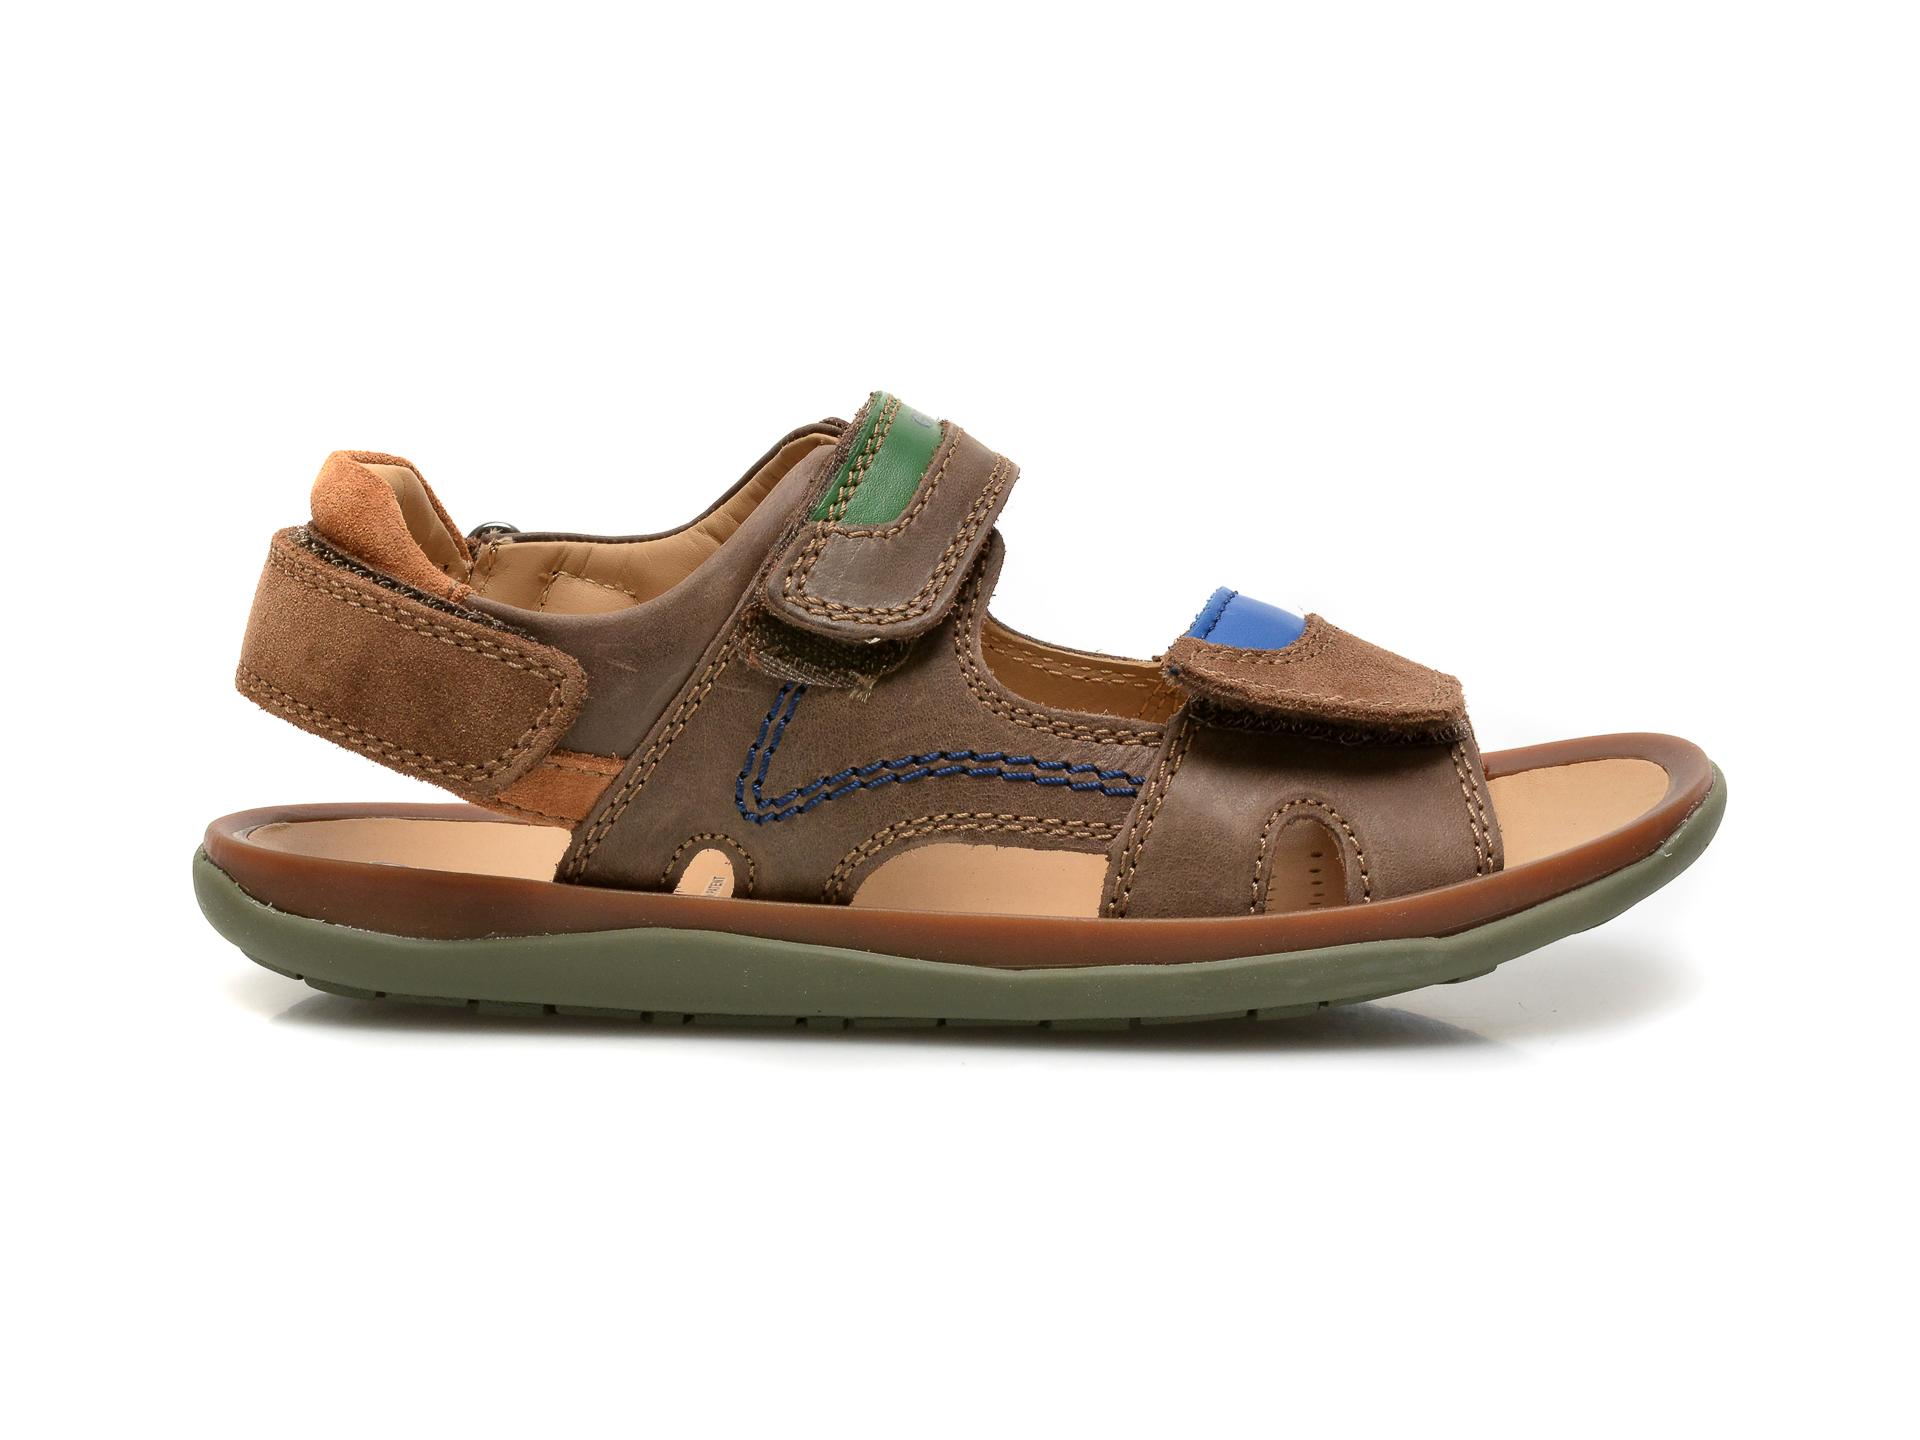 Sandale GEOX maro, J02BBB, din piele naturala - 1